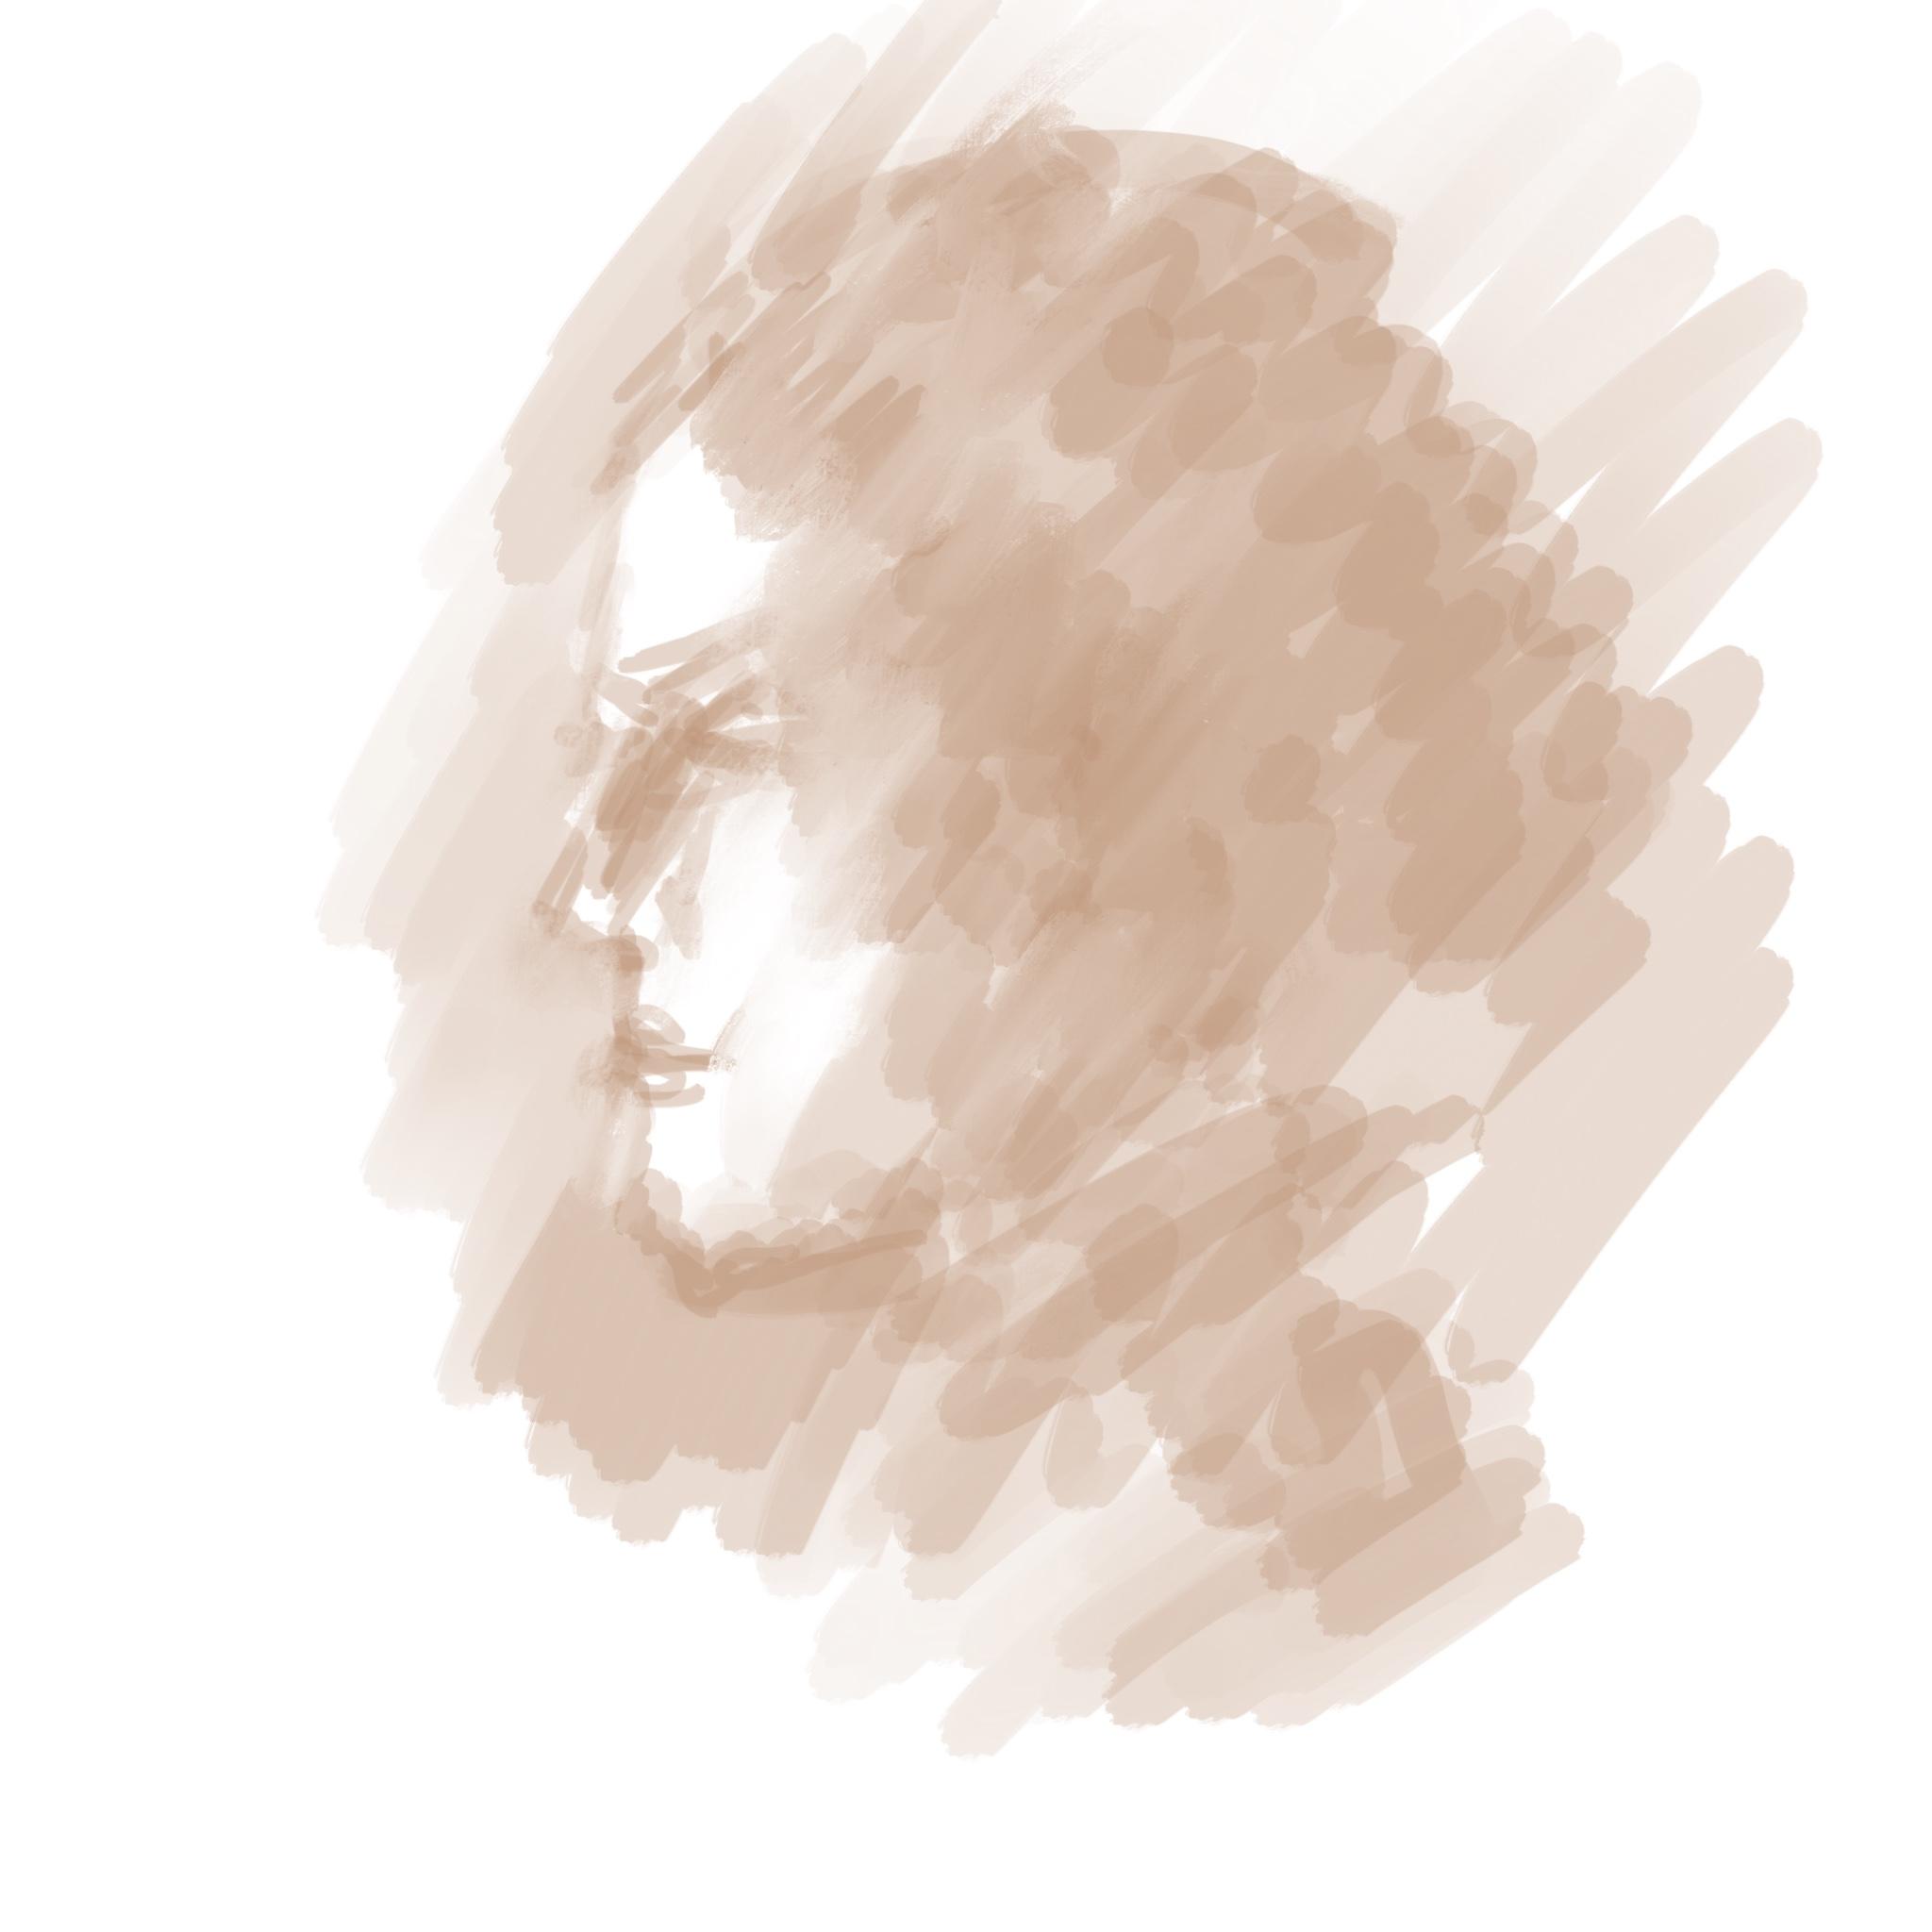 "Geoff Watson, ""Profile from imagination,"" iPad sketch, 2018."